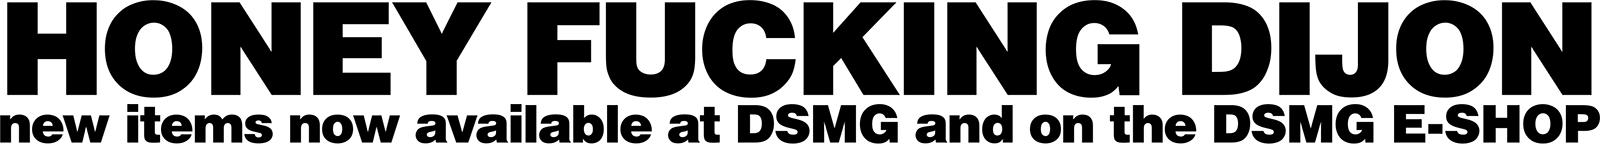 dsmg_hfd-title1600.png